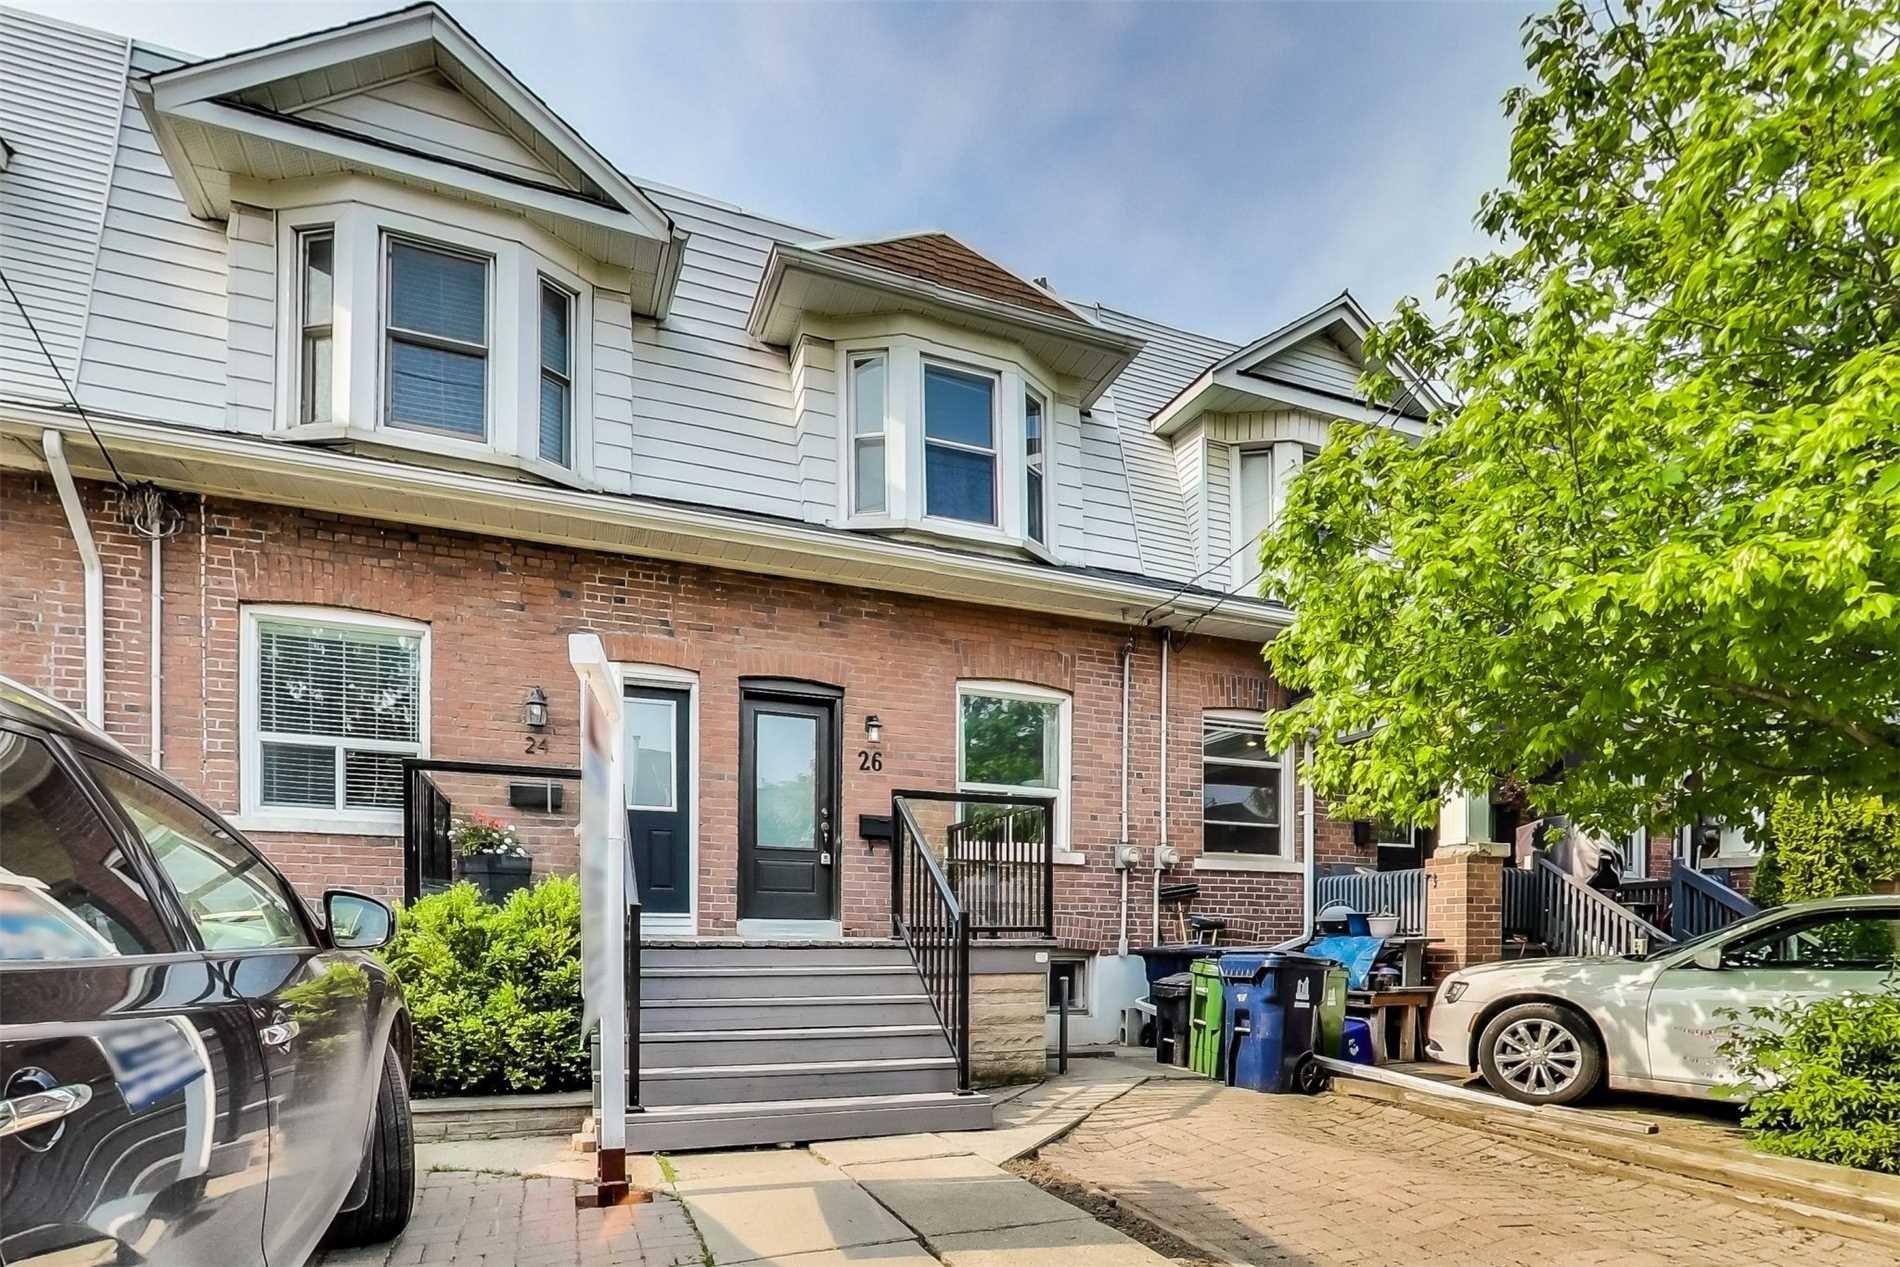 Main Photo: 26 Ashland Avenue in Toronto: Woodbine Corridor House (2-Storey) for sale (Toronto E02)  : MLS®# E4472945